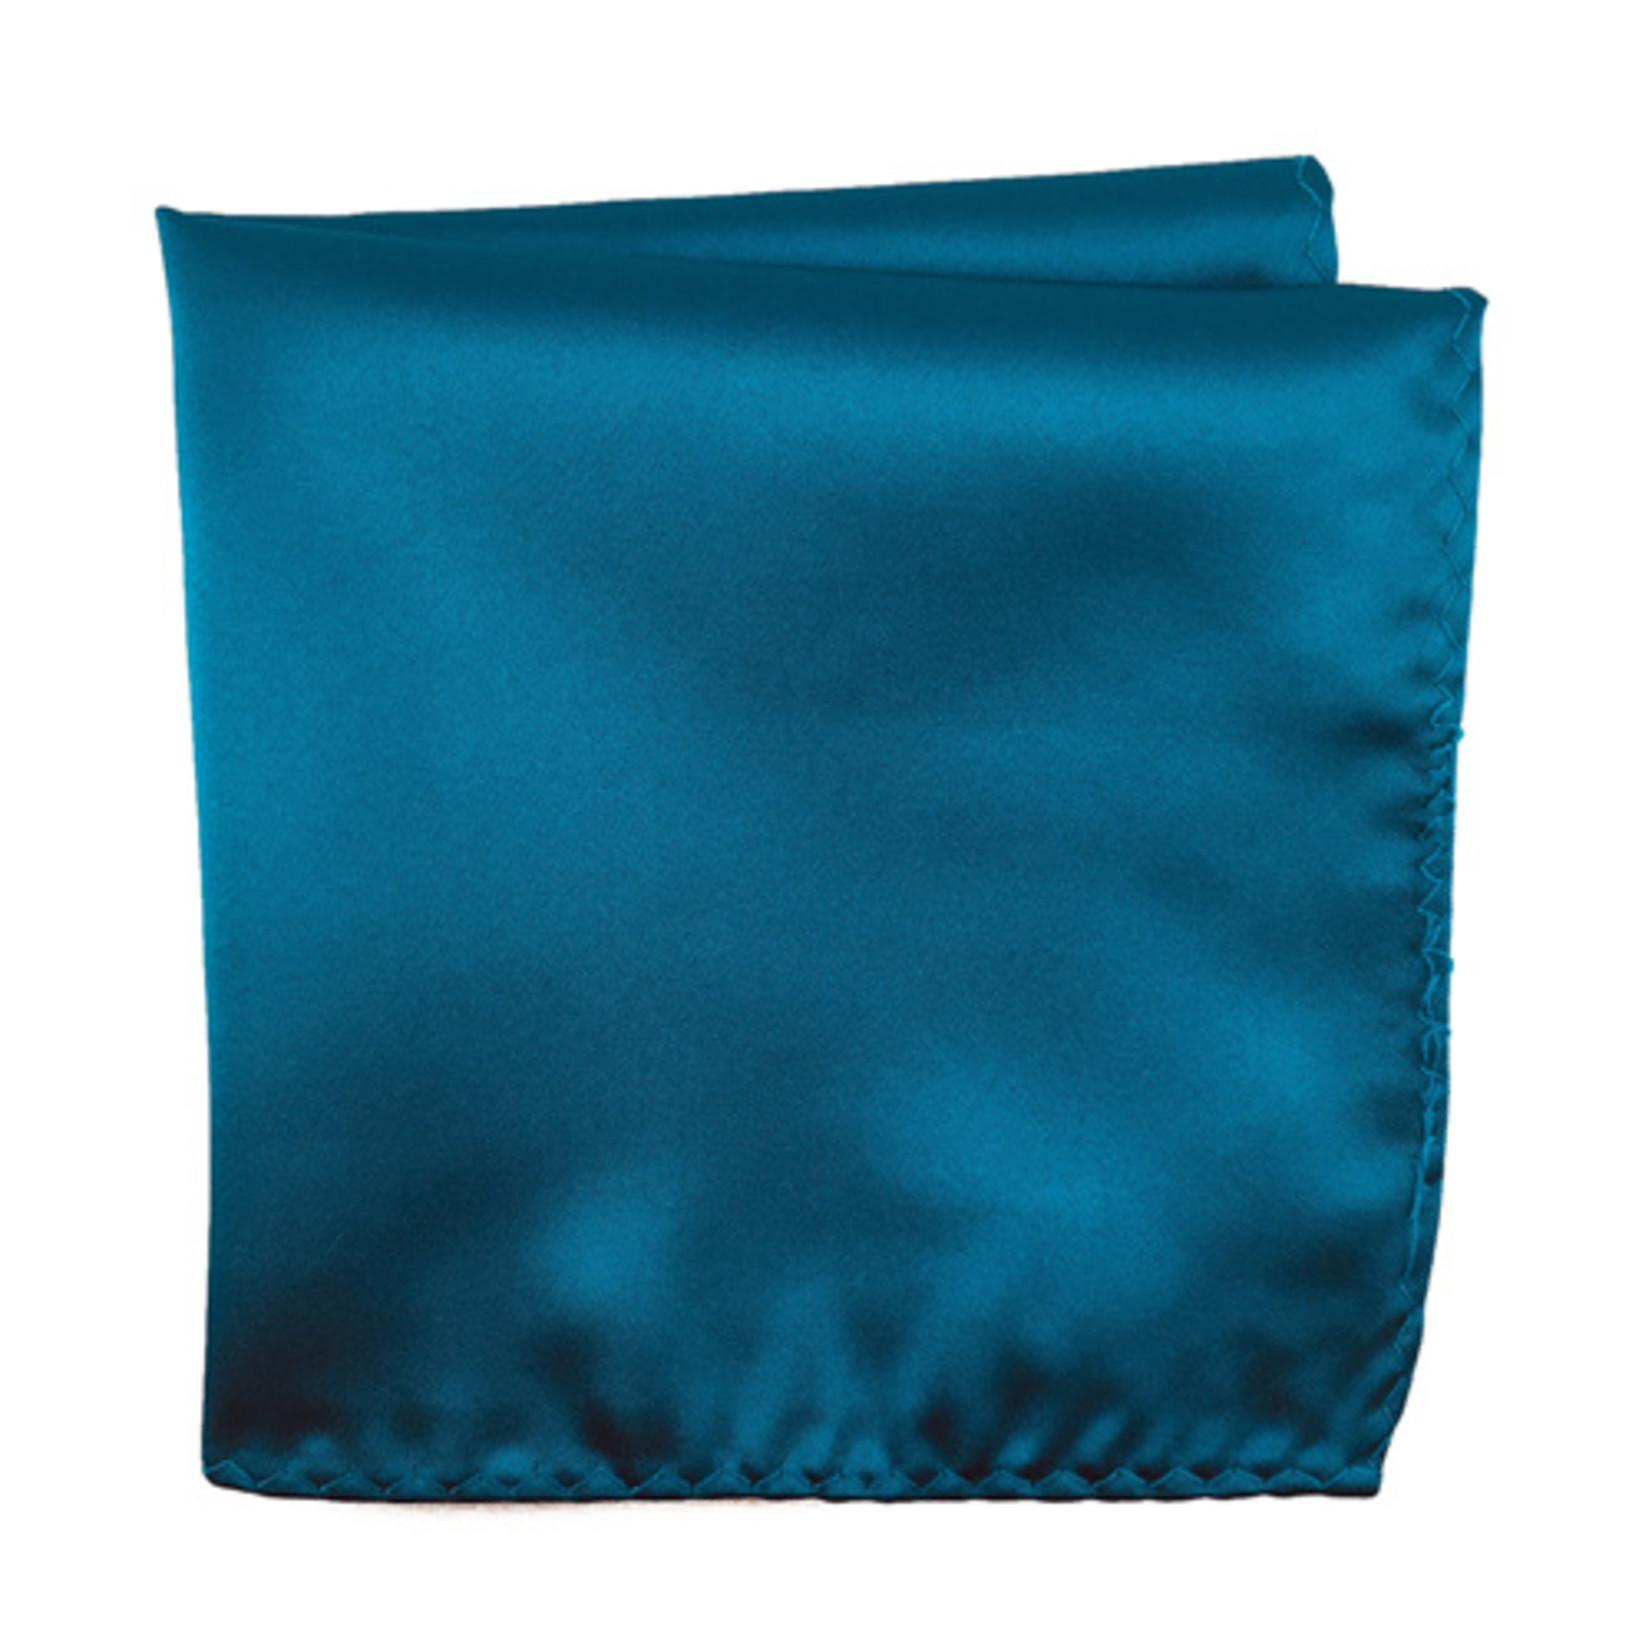 Knotz M100PSQ-22 Solid Teal Pocket Square